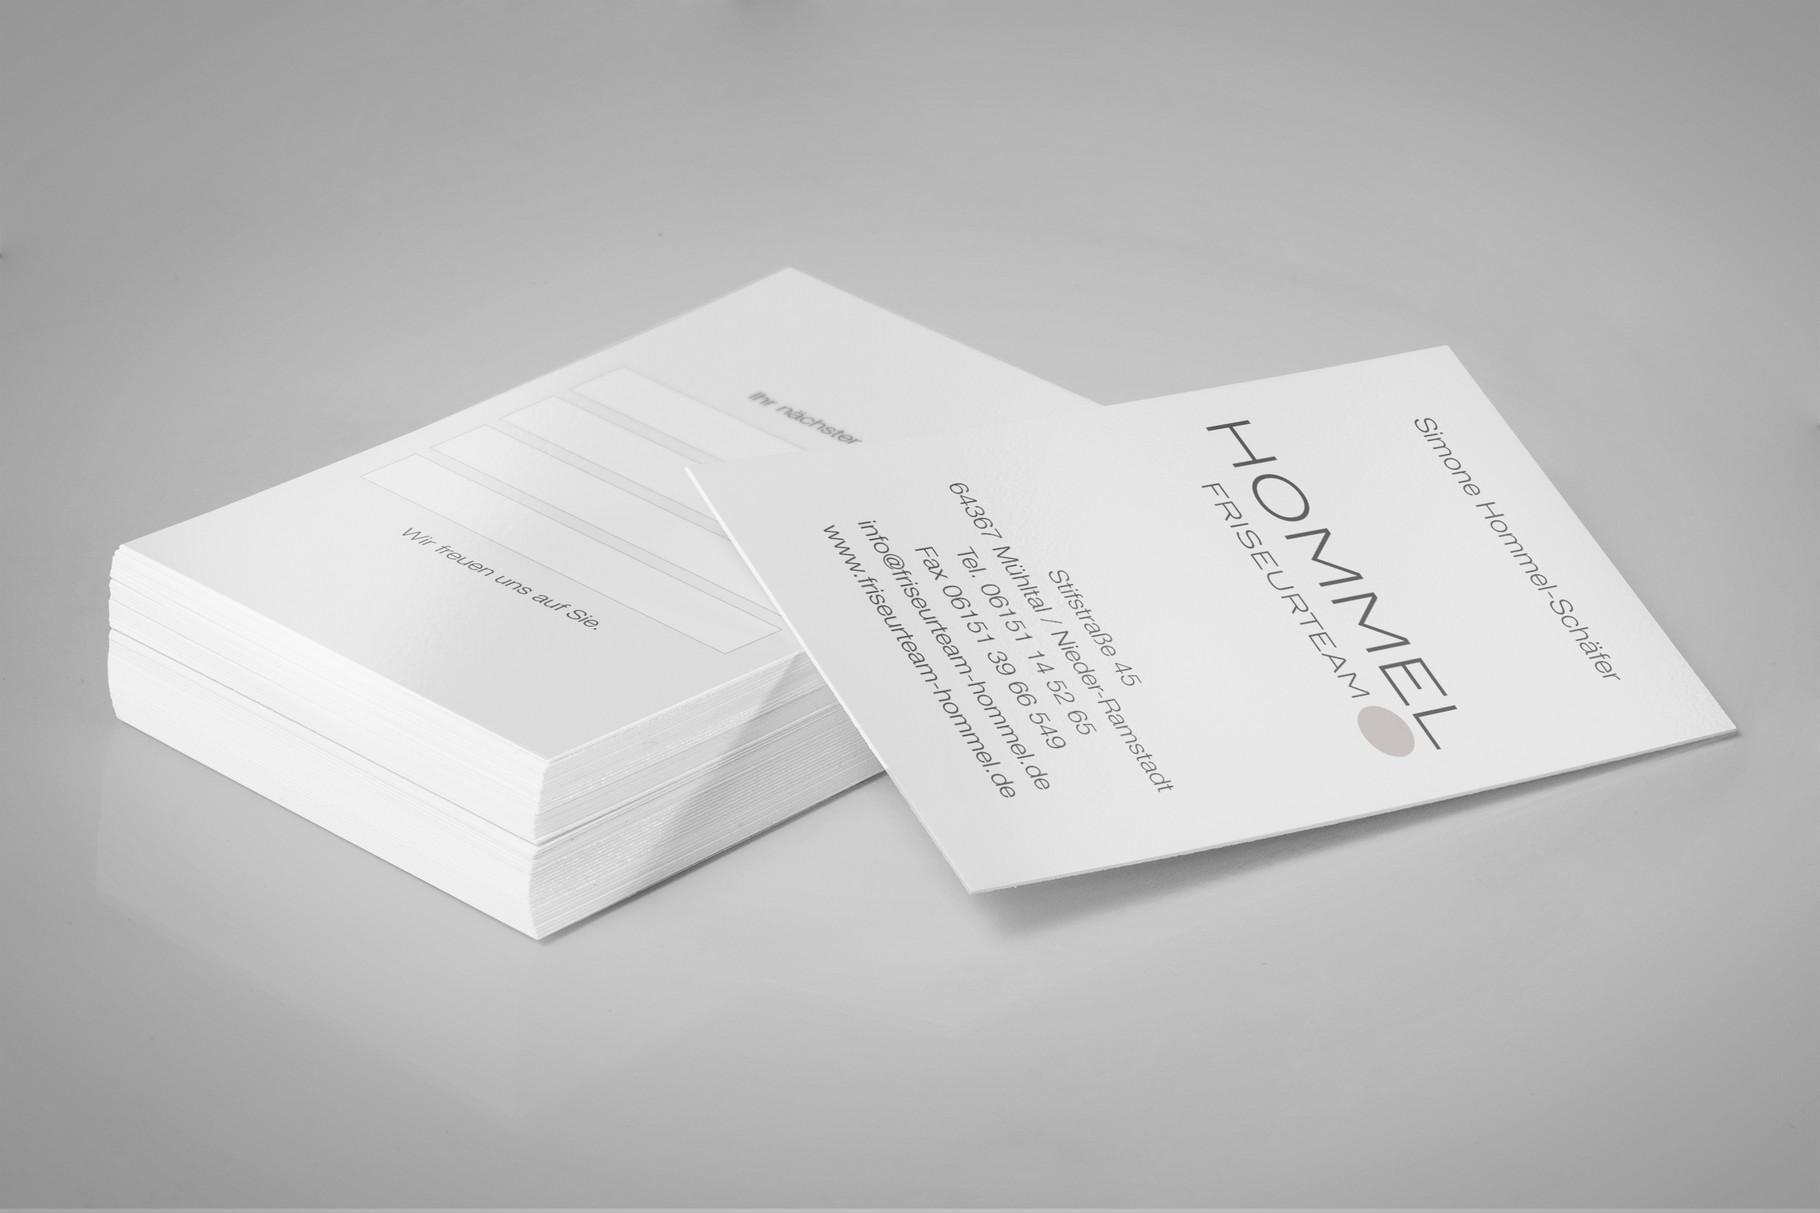 Corporate Design, Logoentwicklung, Logo, Grafikdesign, Grafik, Gestaltung, Hommel Visitenkarte